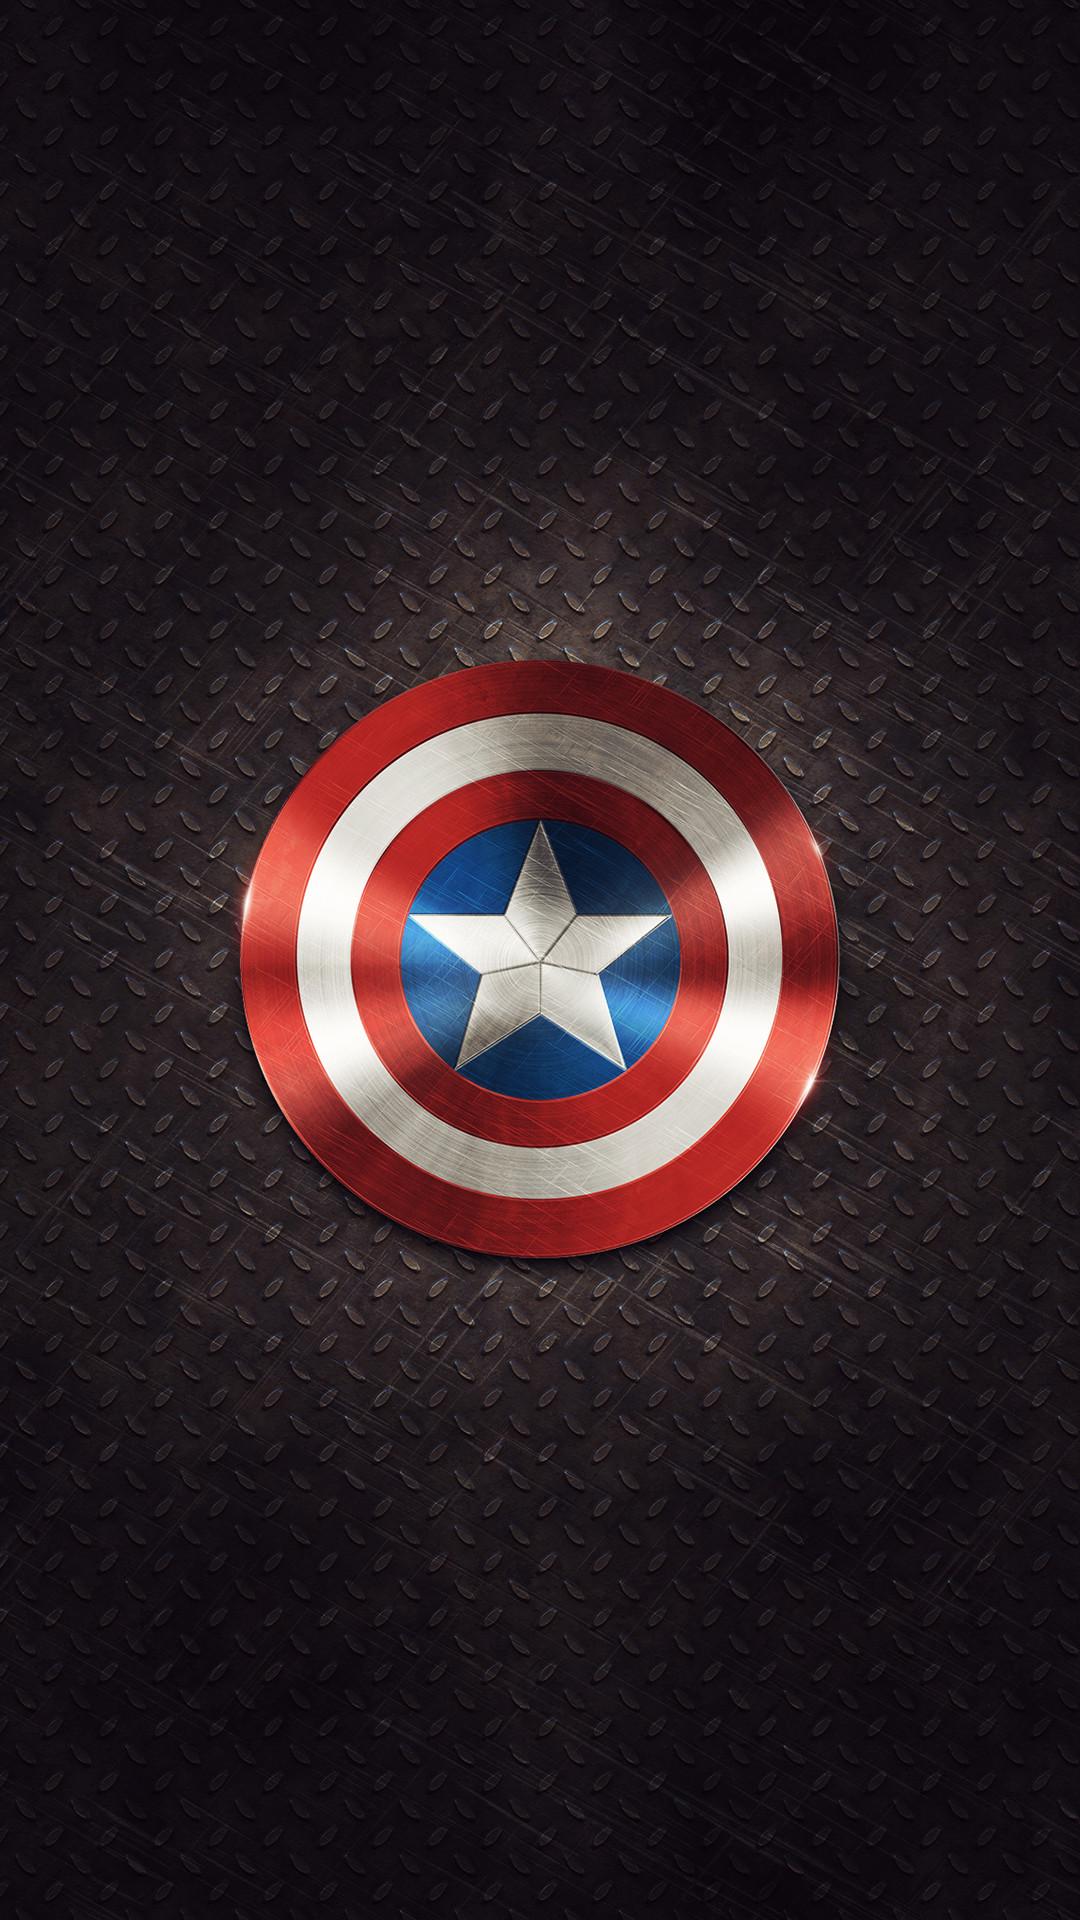 Captain America Shield Android Wallpaper …